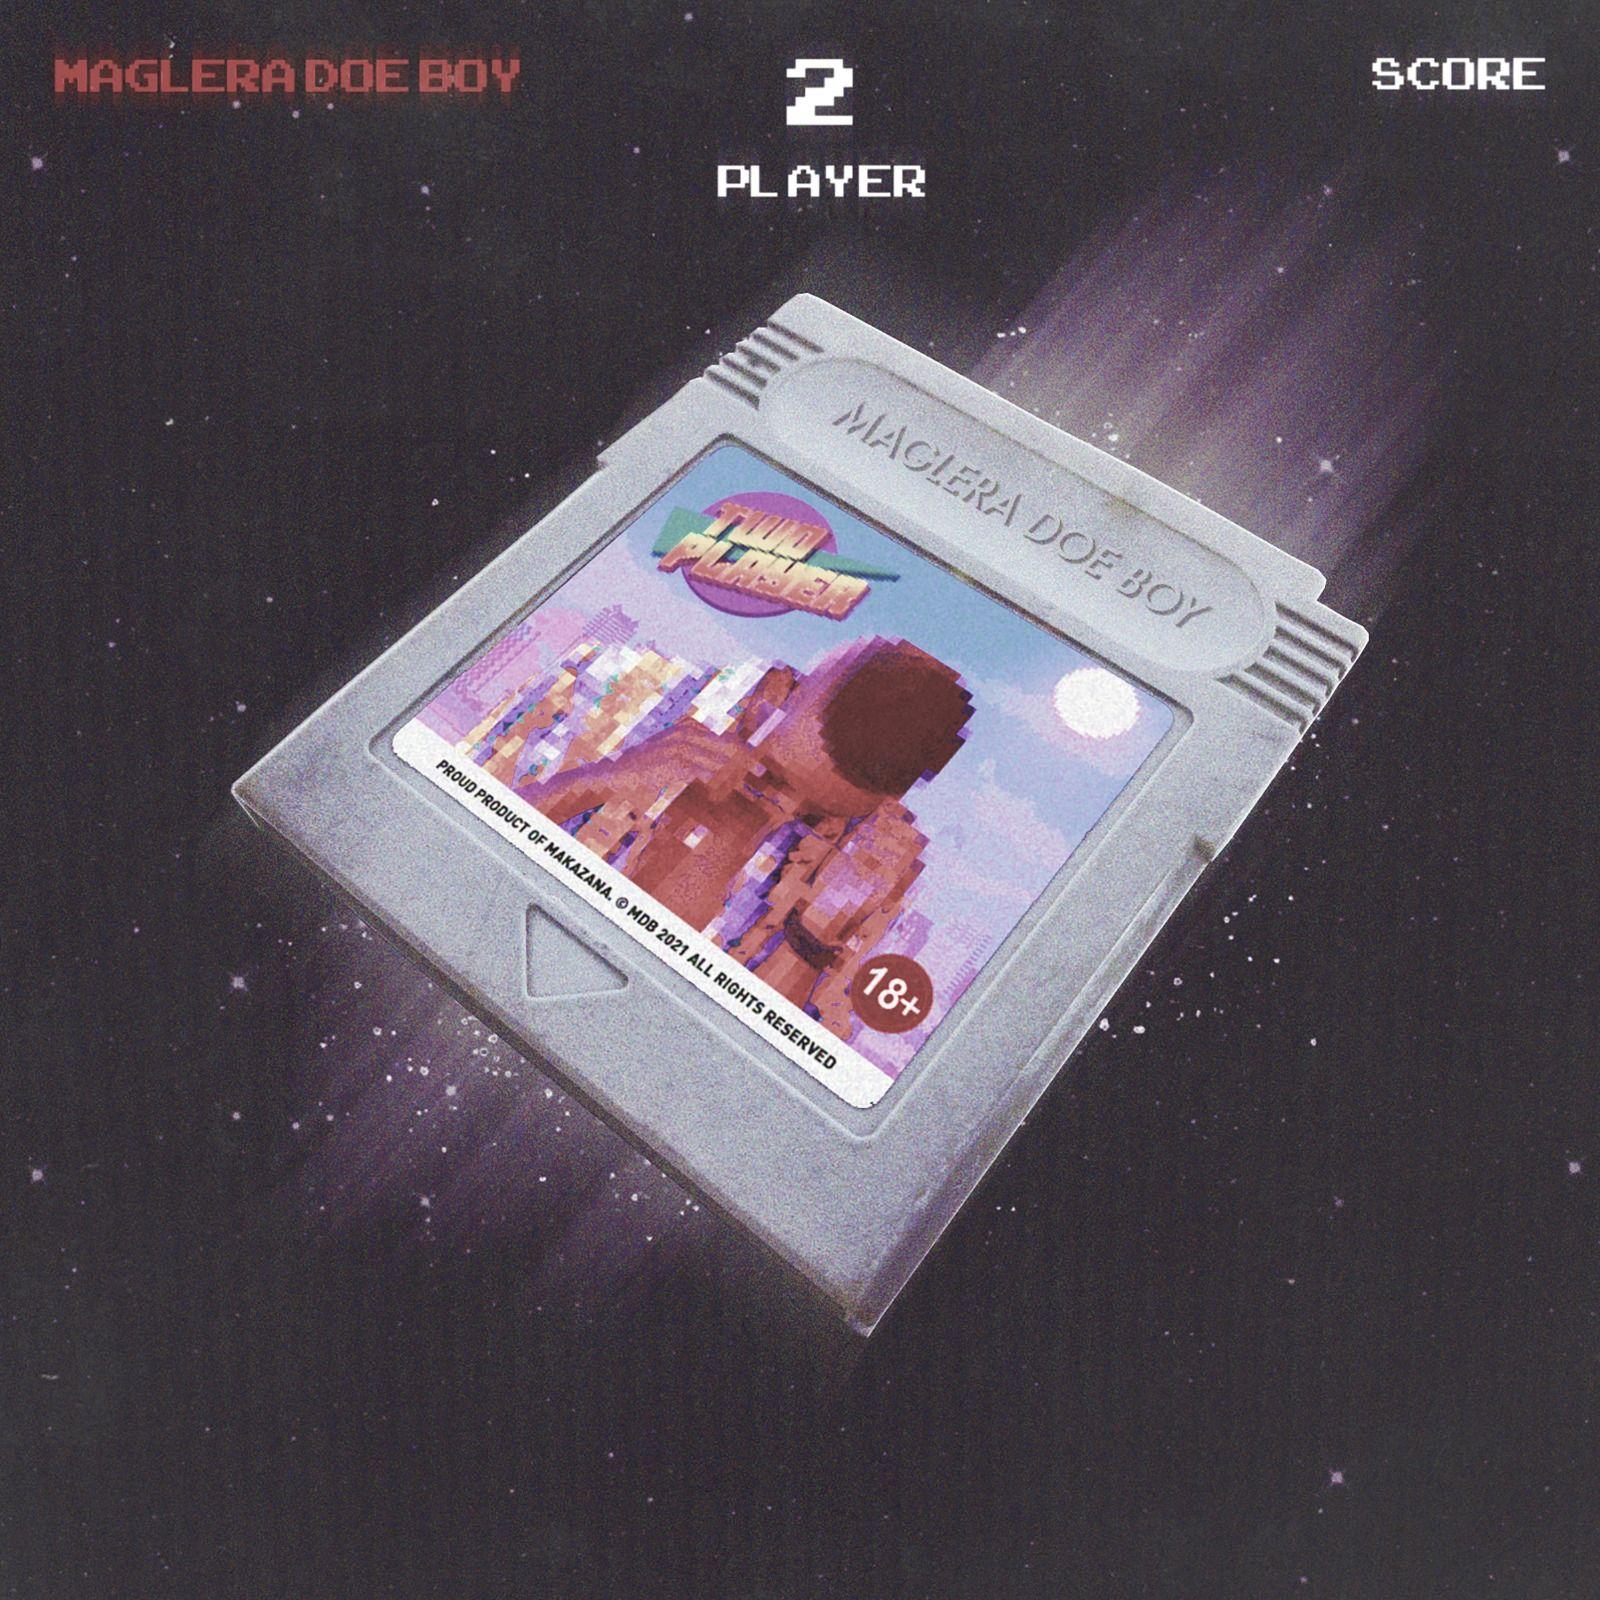 [Album] Maglera Doe Boy – 2Player (The Digital Score) mp3 download